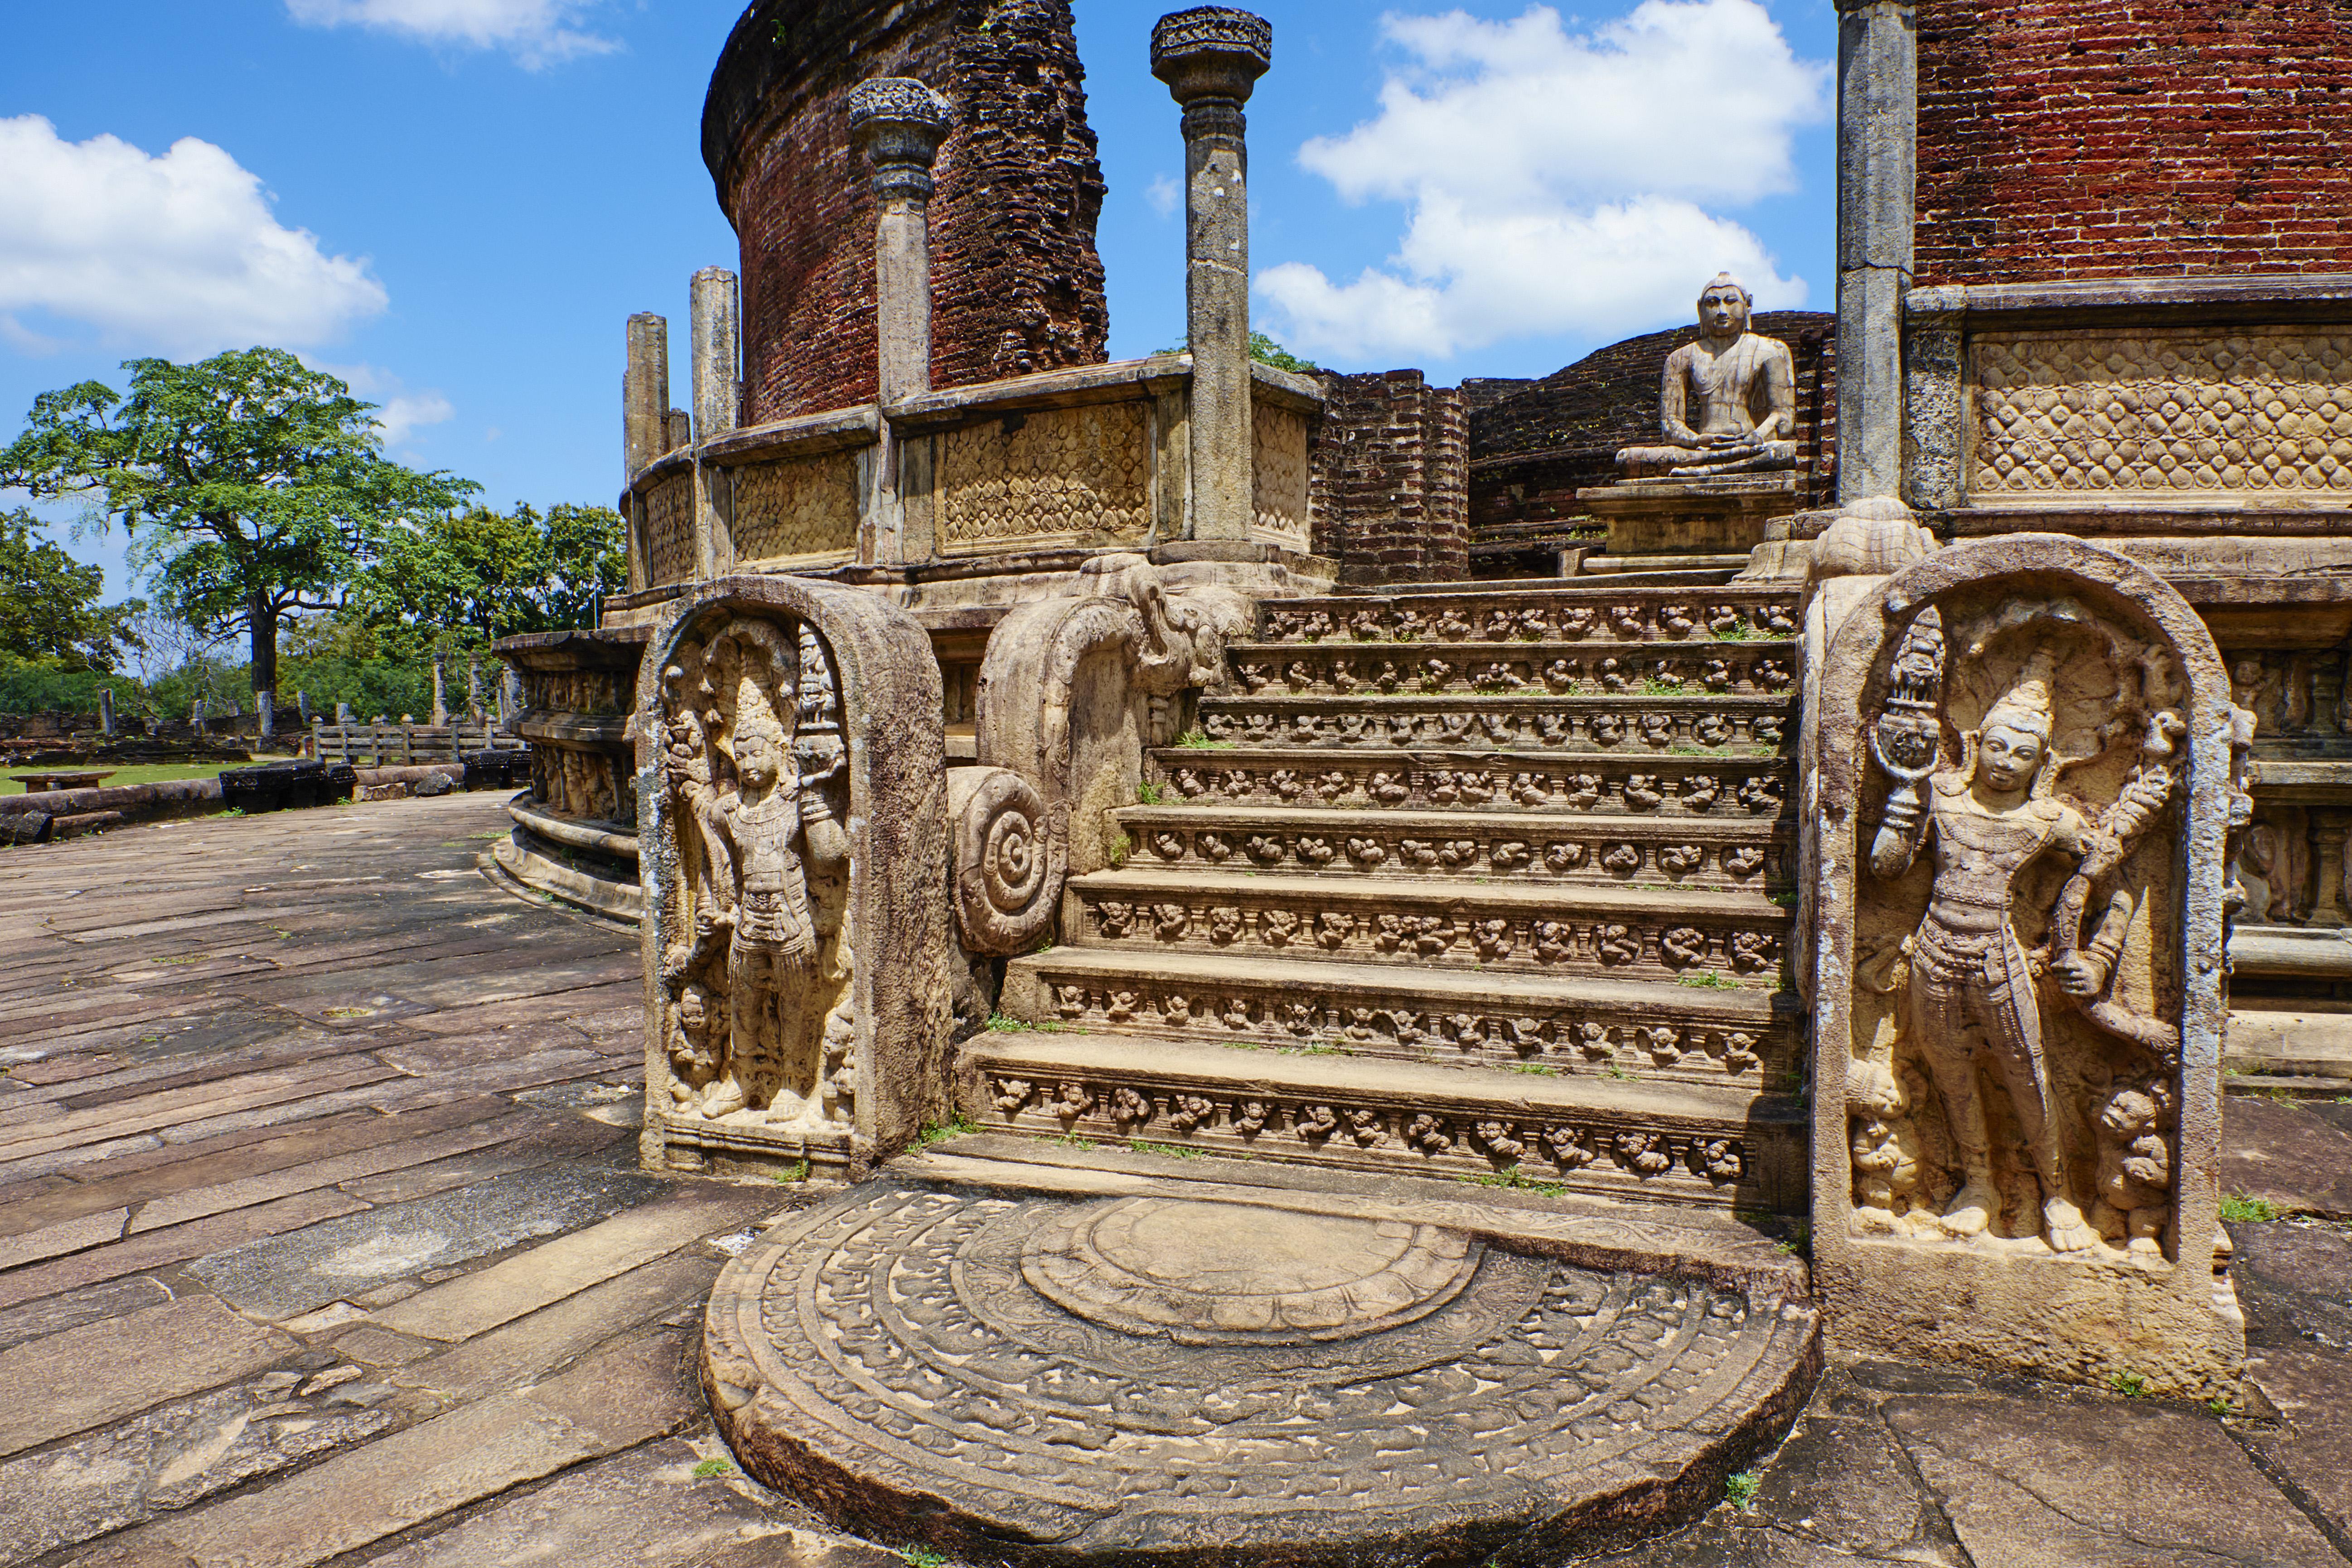 Sri Lanka, Polonnaruwa, quadrangle